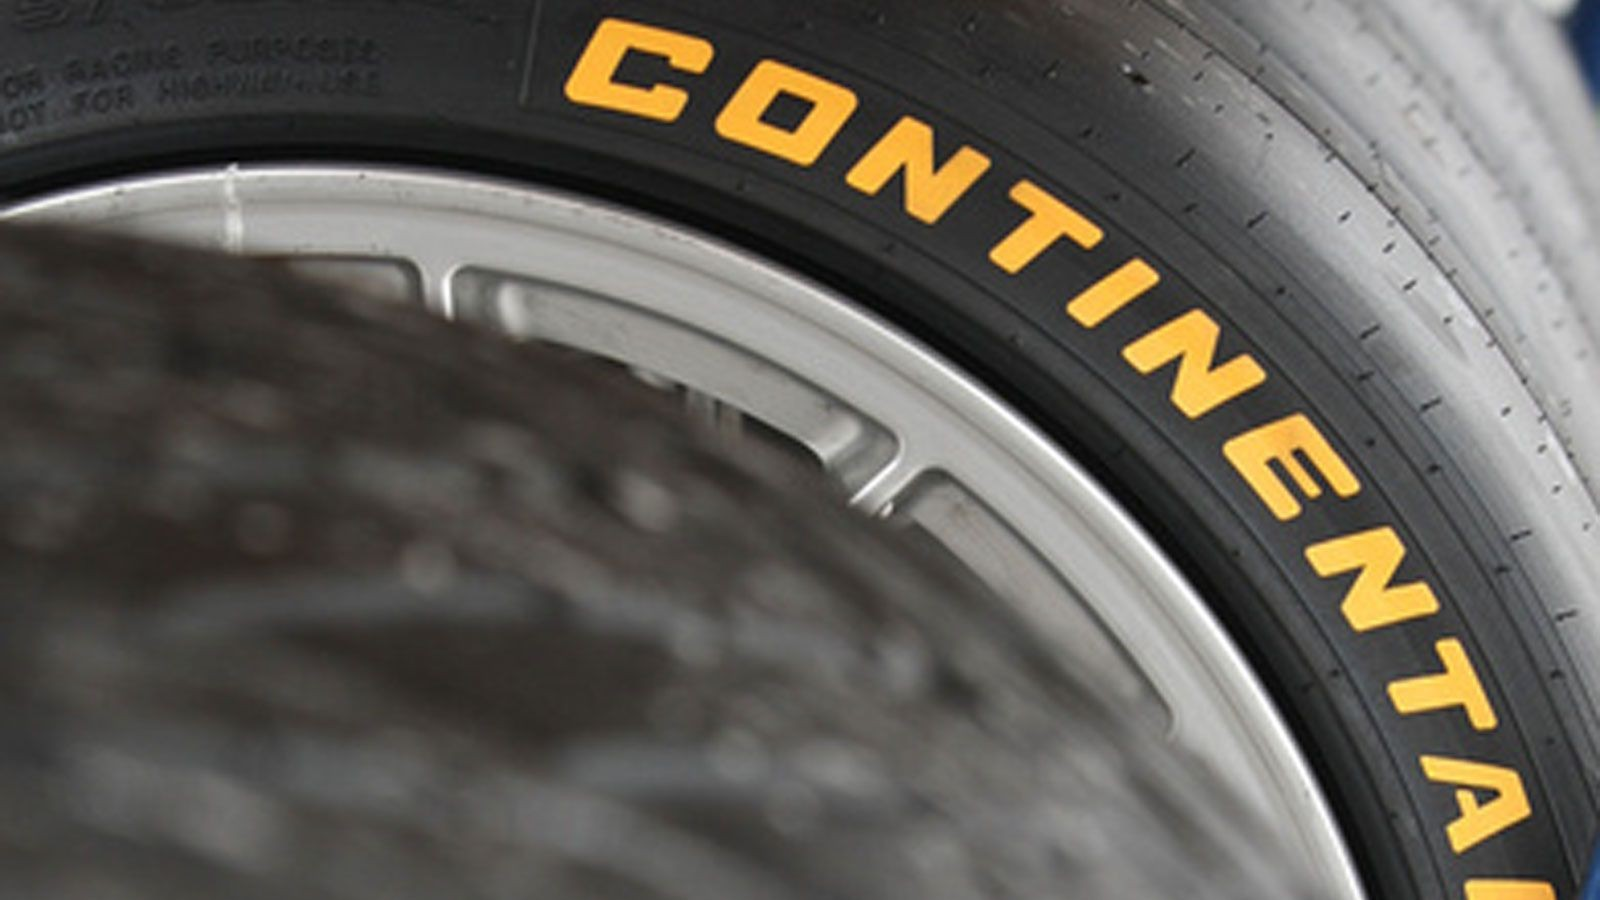 continental-tire-and-imsa-partnership-tire_cr